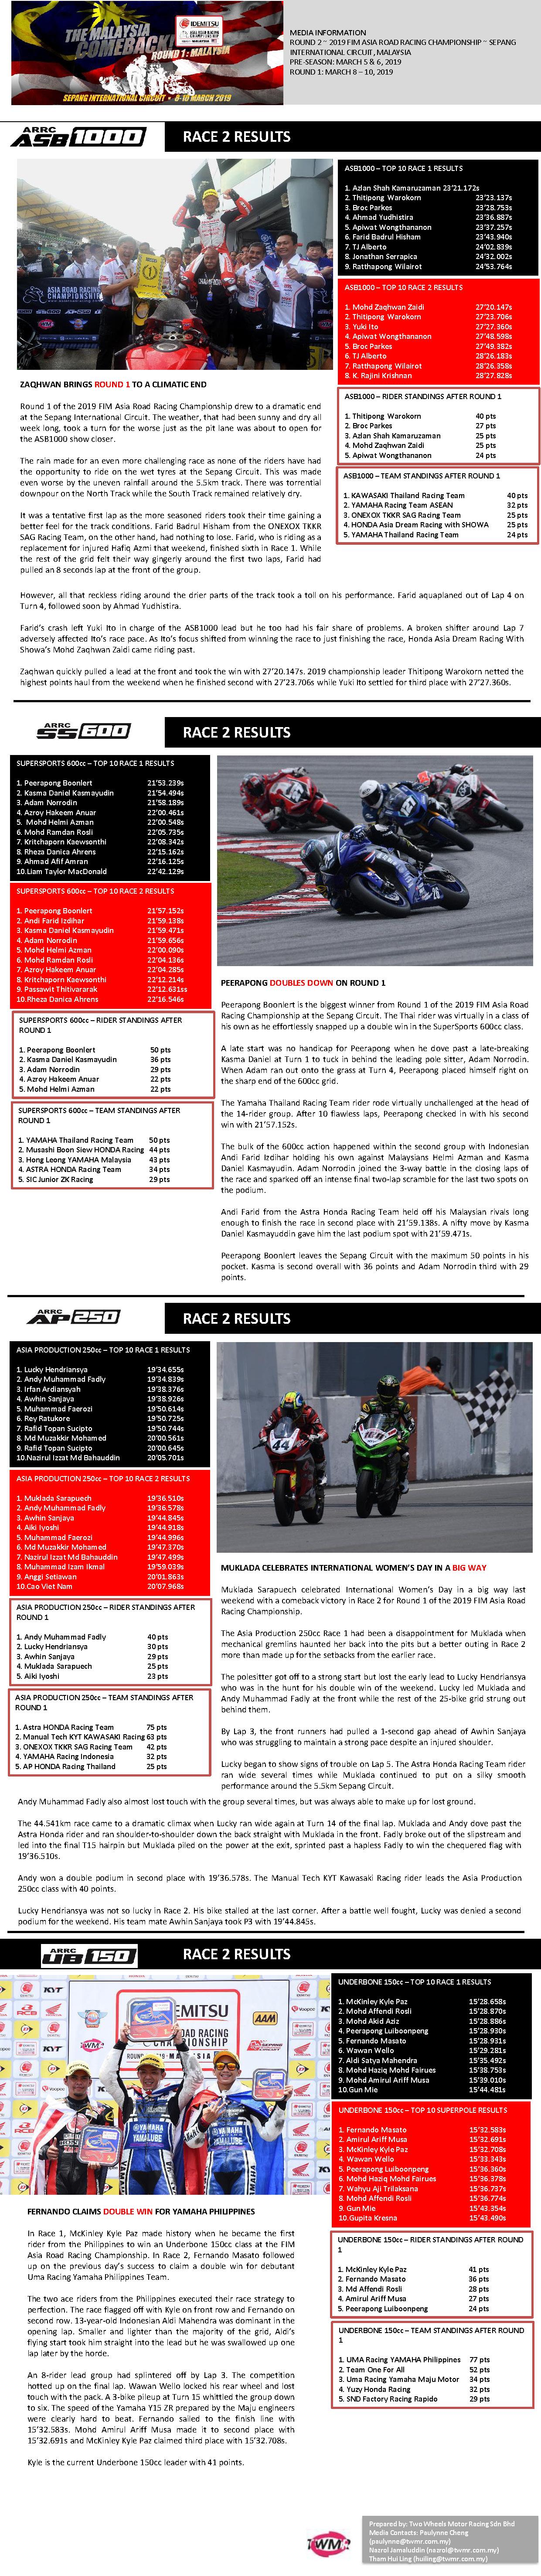 ARRC ASB 1000 Race 2 Results – FIM Asia Live